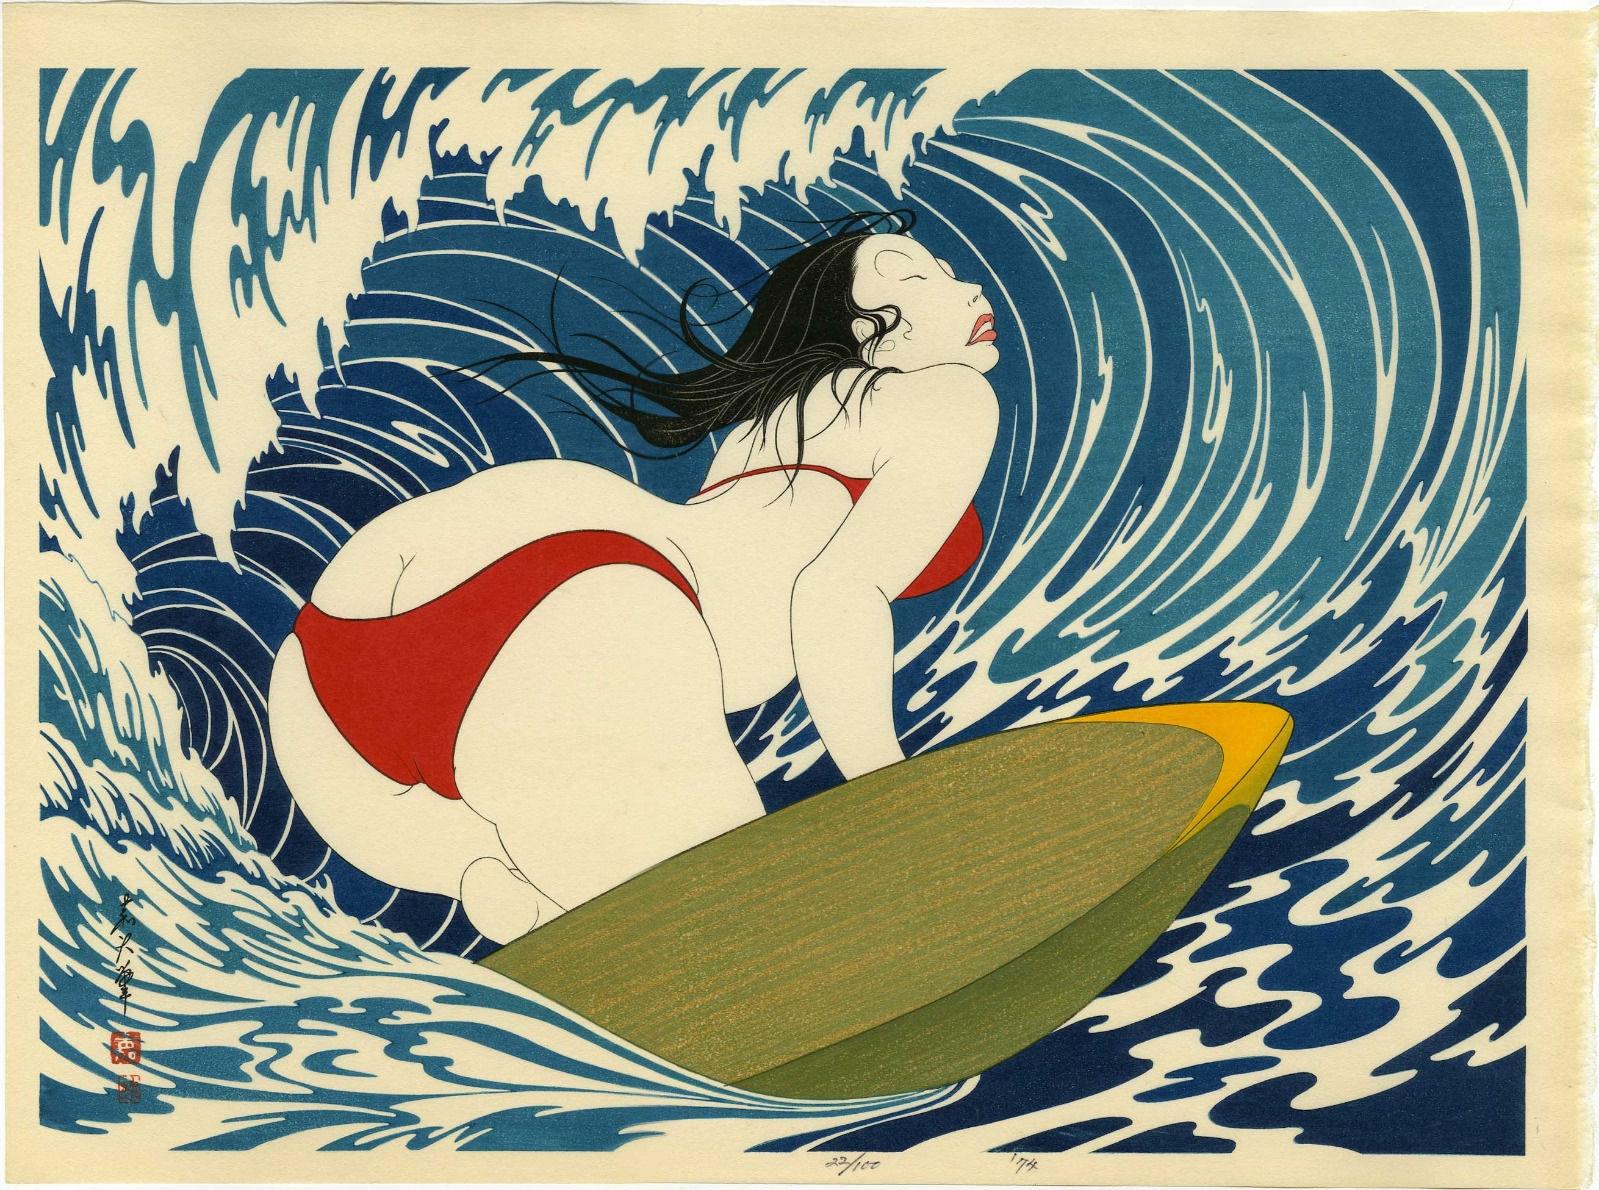 Yoshio okada surfer girl 1974 japanese woodblock print 58 100 comic art